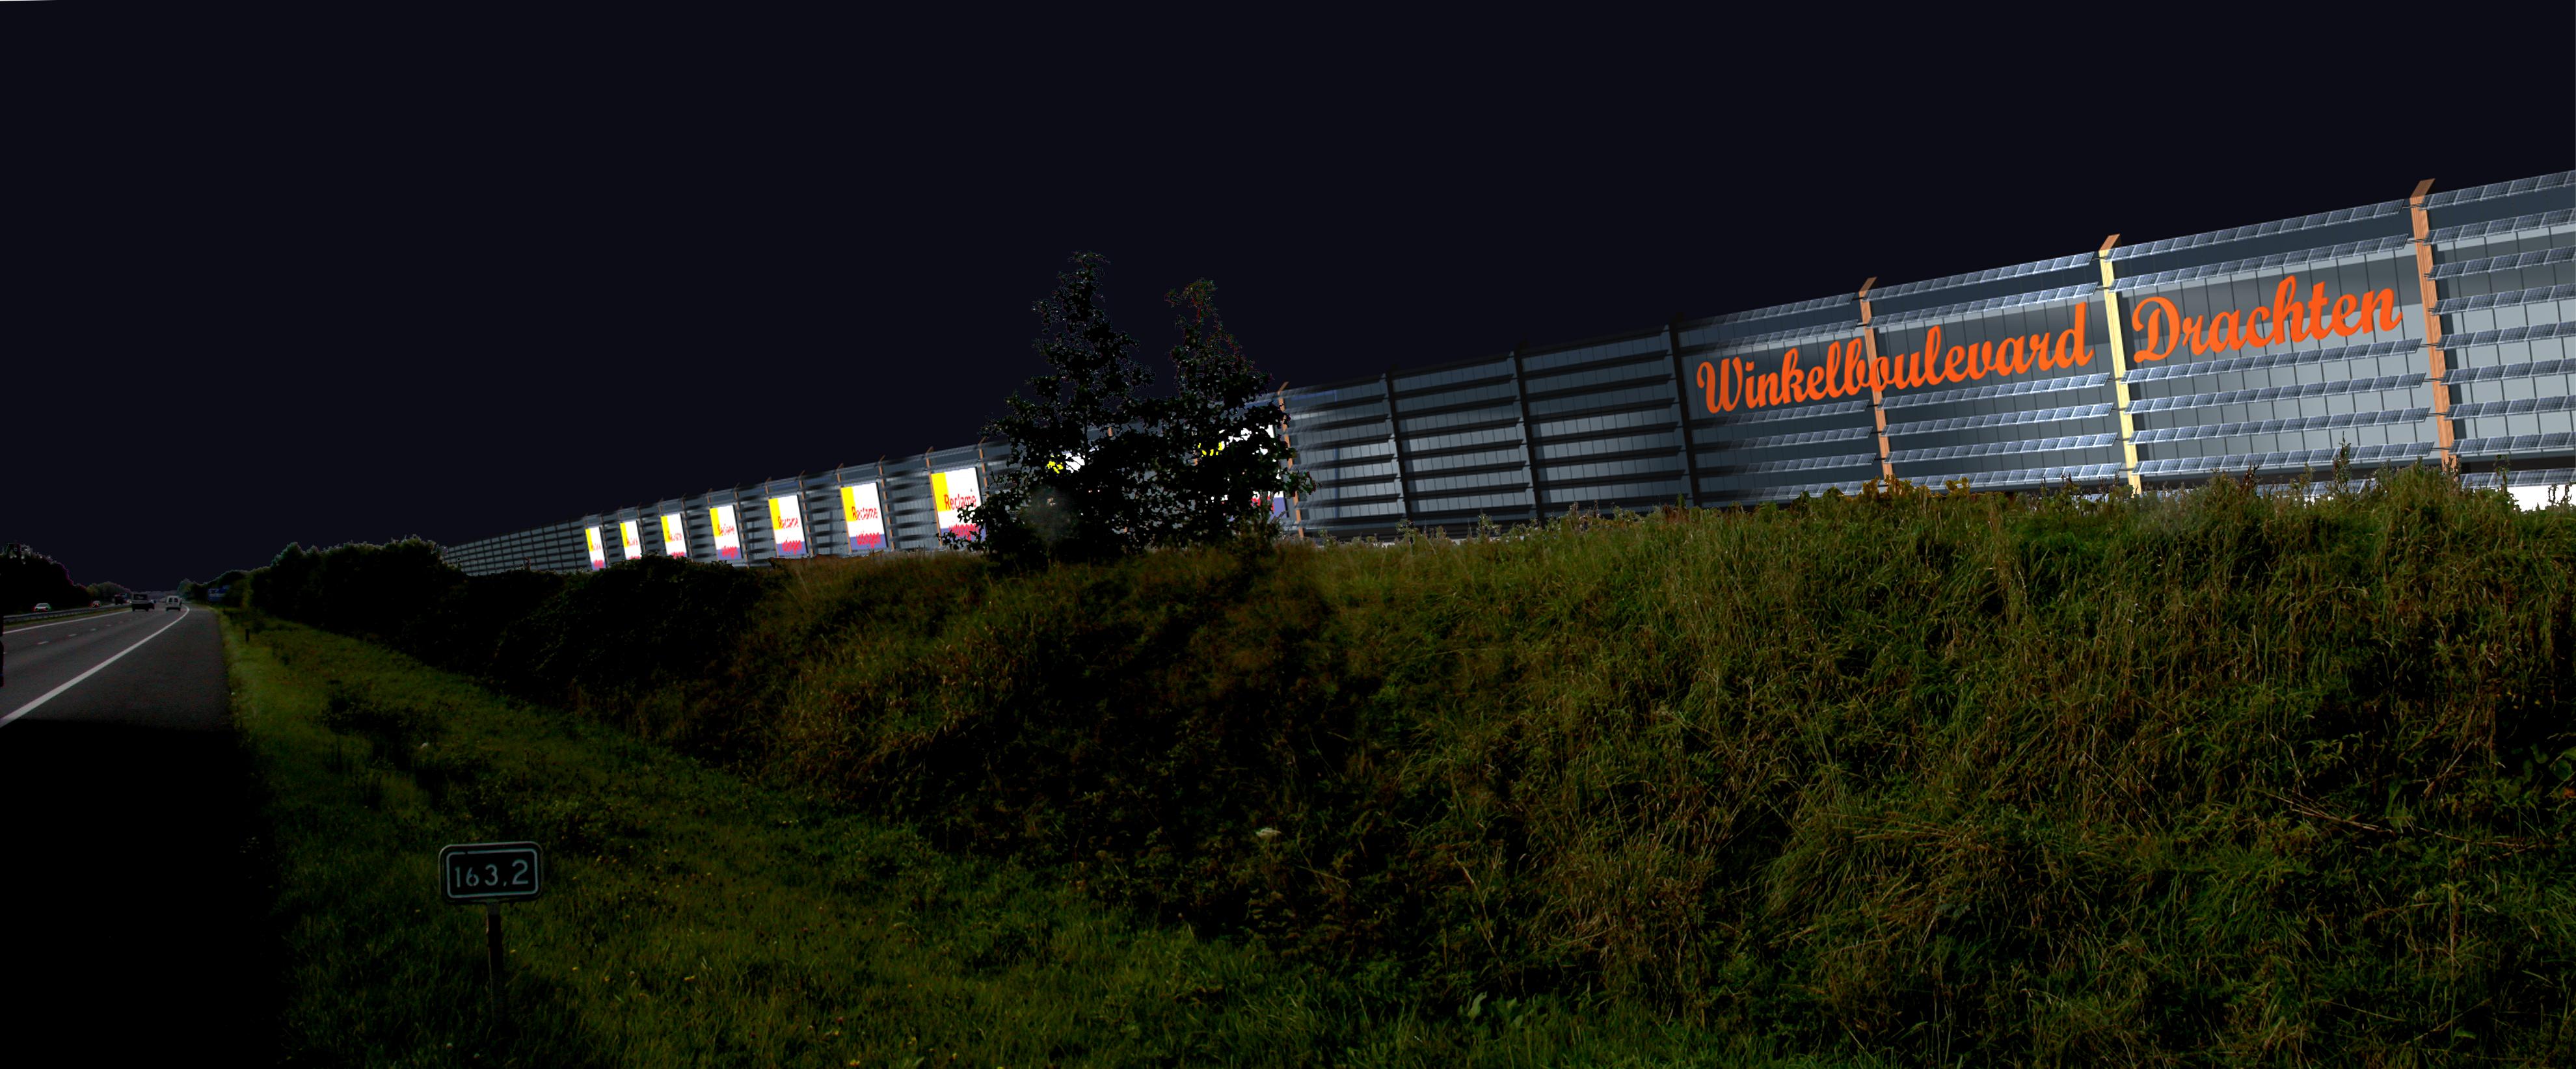 Uitbreiding winkelcentrum Smallingerland nachtopname